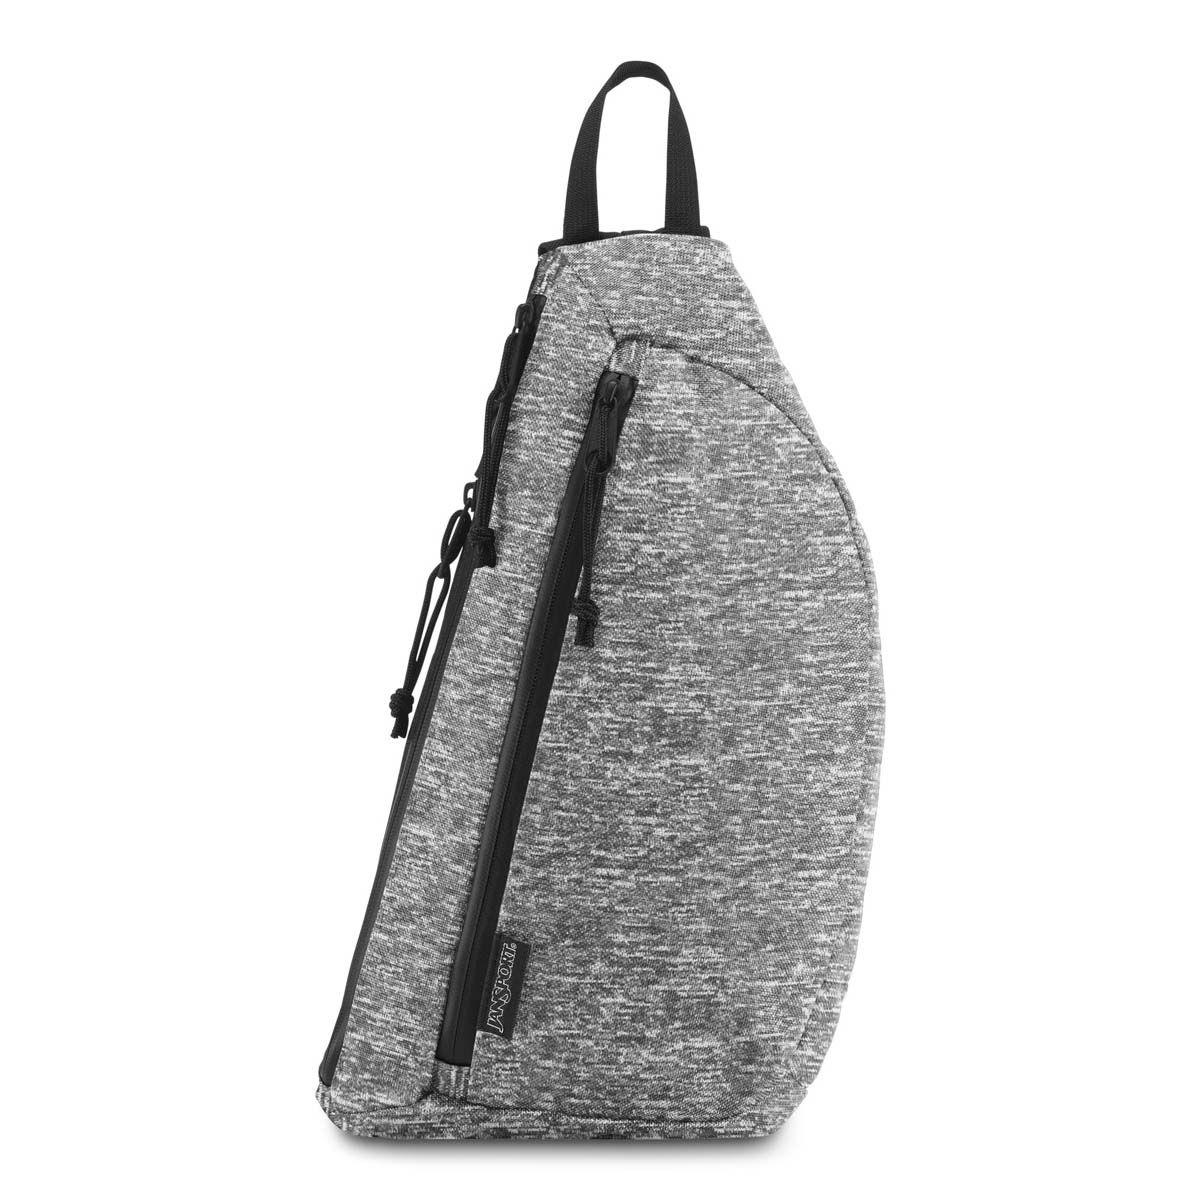 JanSport City Sling Crossbody Bag in Black Woven Knit